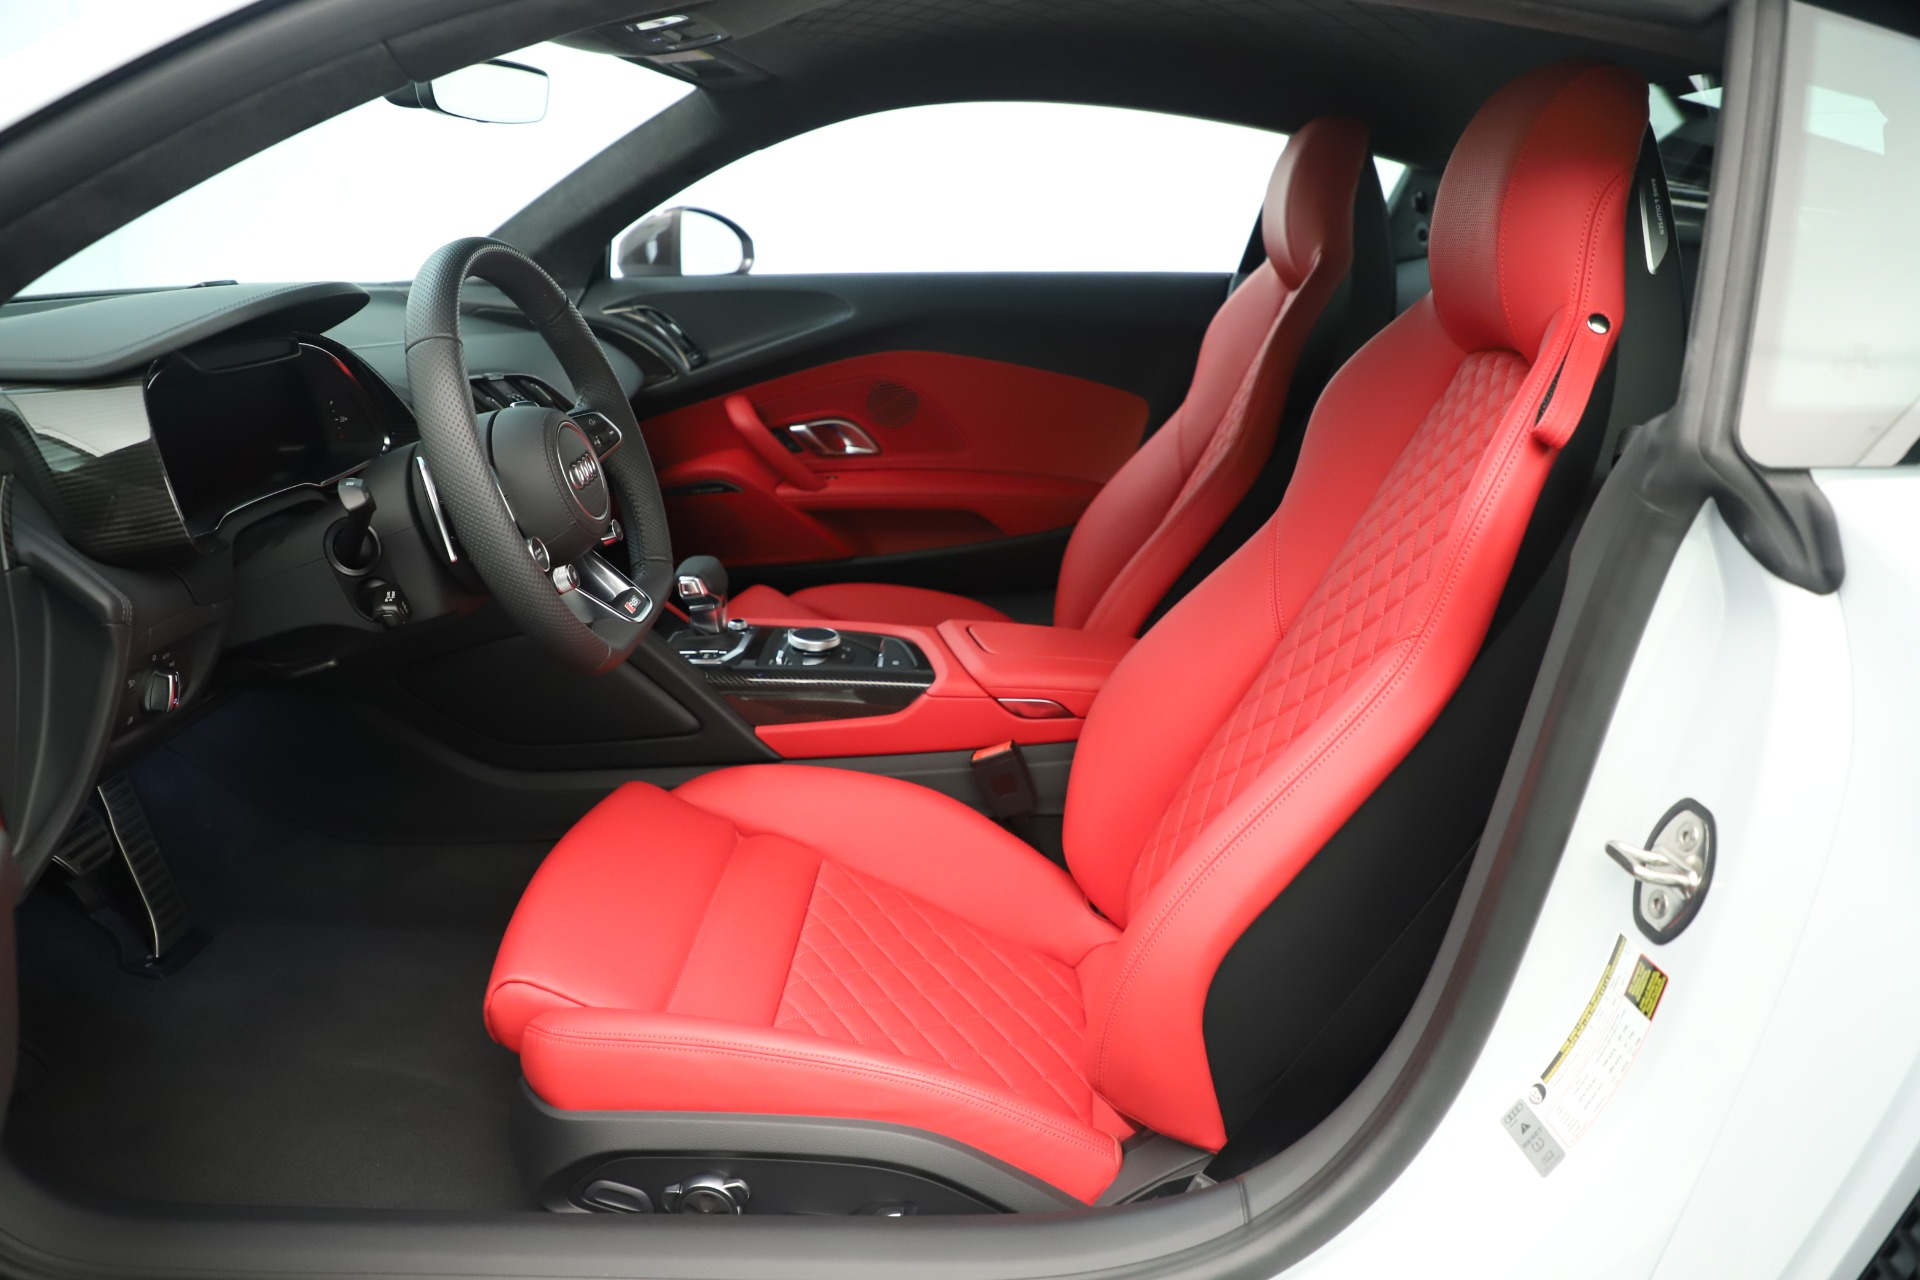 Used 2018 Audi R8 5.2 quattro V10 Plus For Sale In Greenwich, CT 3360_p15